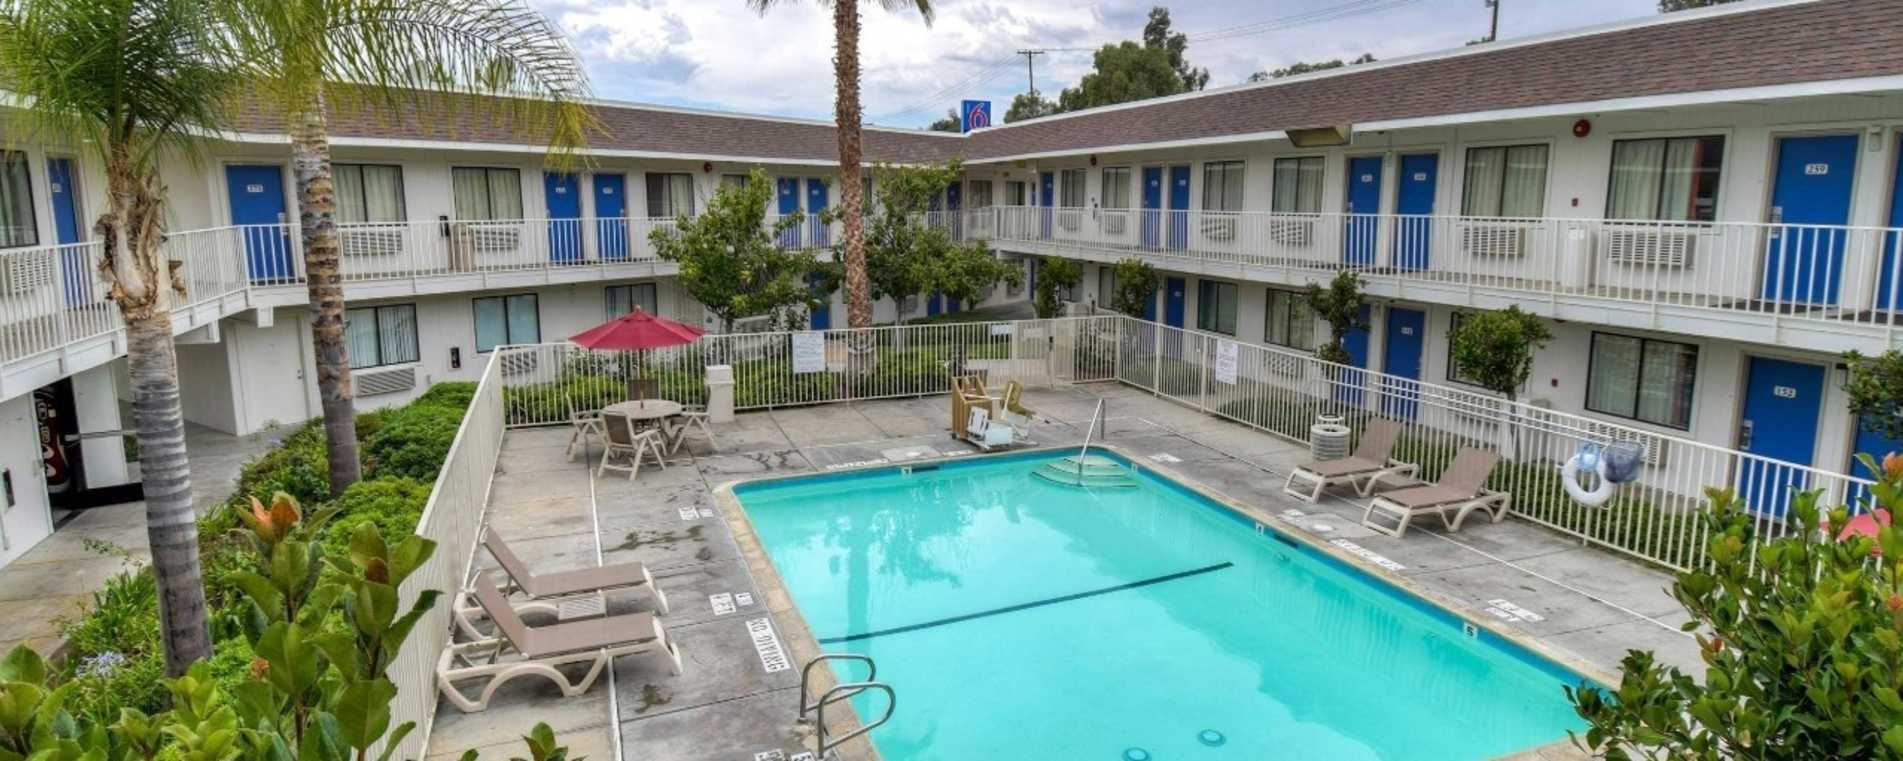 Pool Area - Motel 6 Temecula